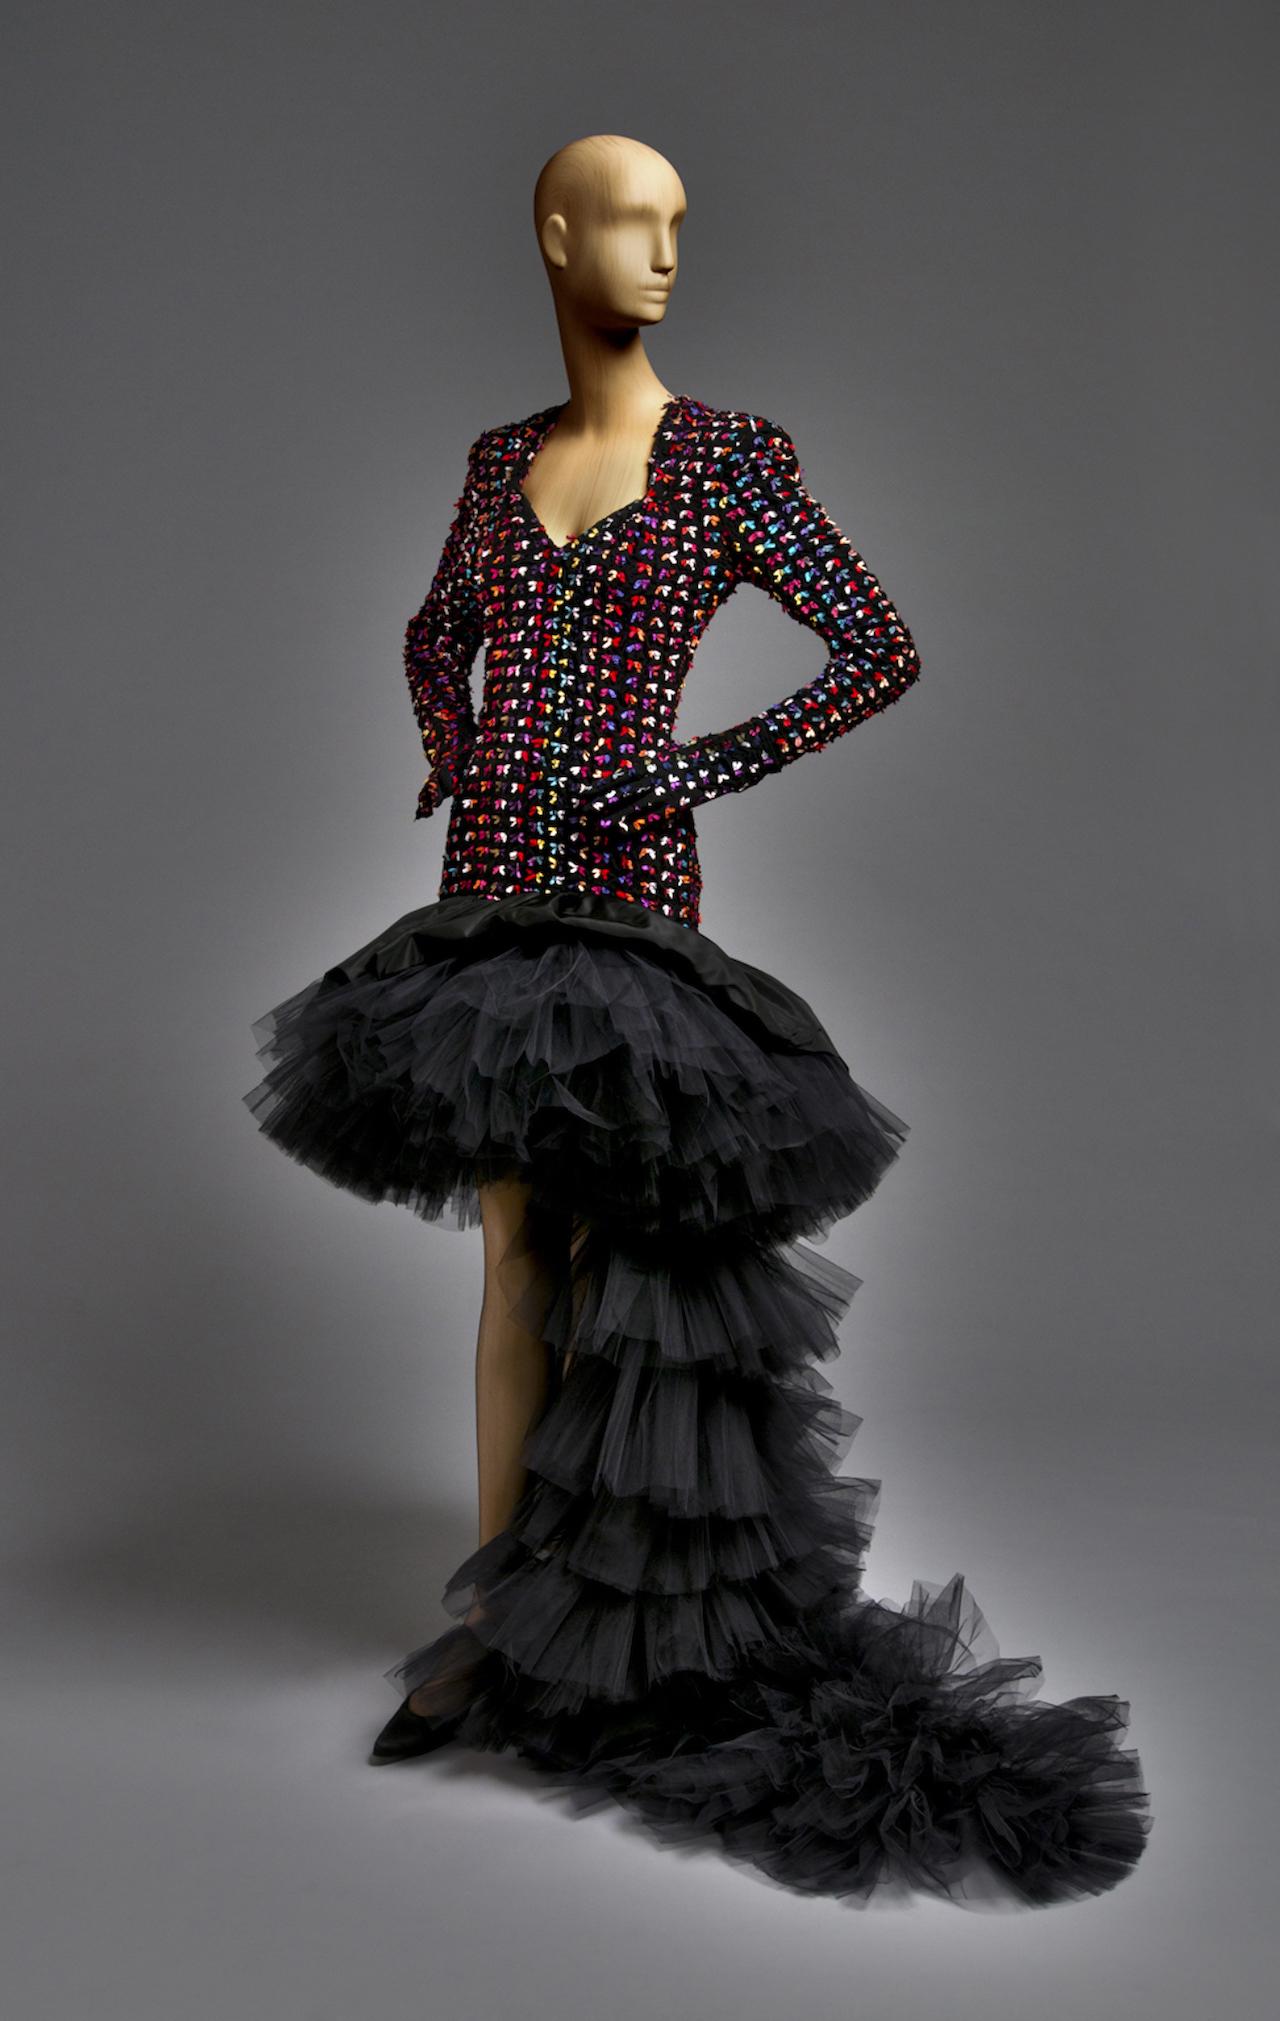 Black Dress with Bow Embellishments Patrick Kelly, 1988 (Courtesy of Philadelphia Museum of Art)